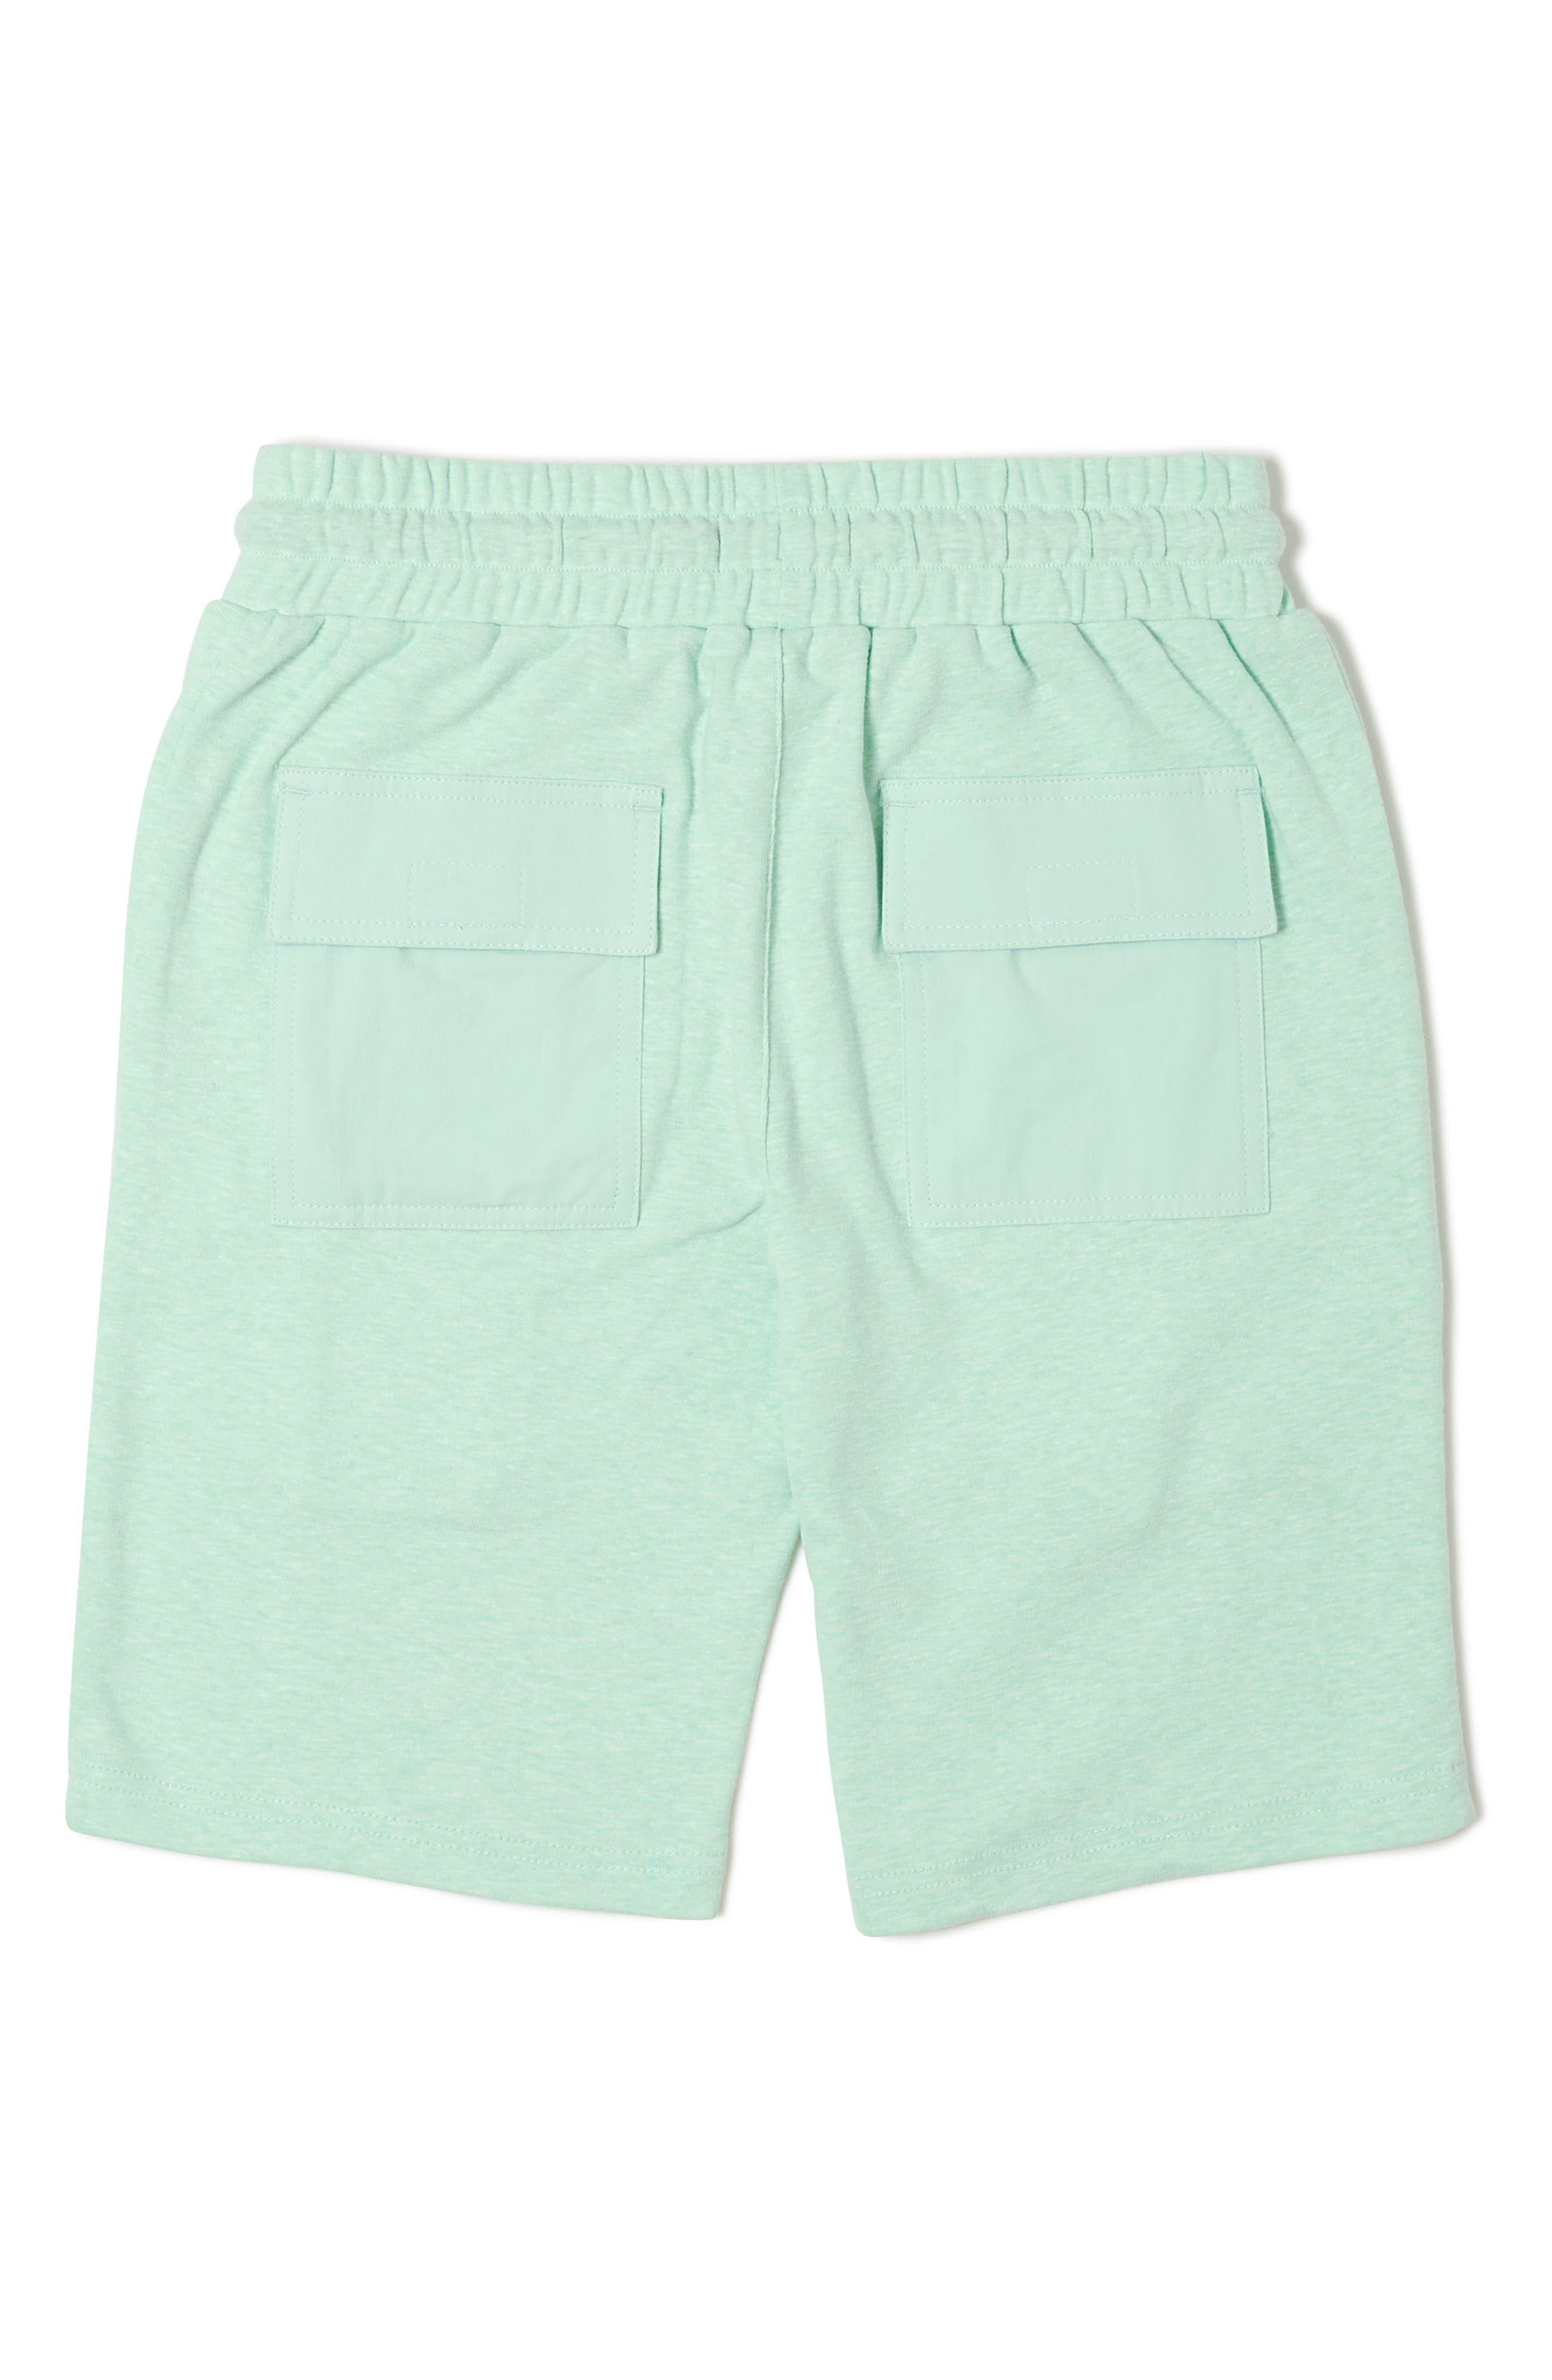 Ranger Knit Shorts,                             Alternate thumbnail 2, color,                             Green